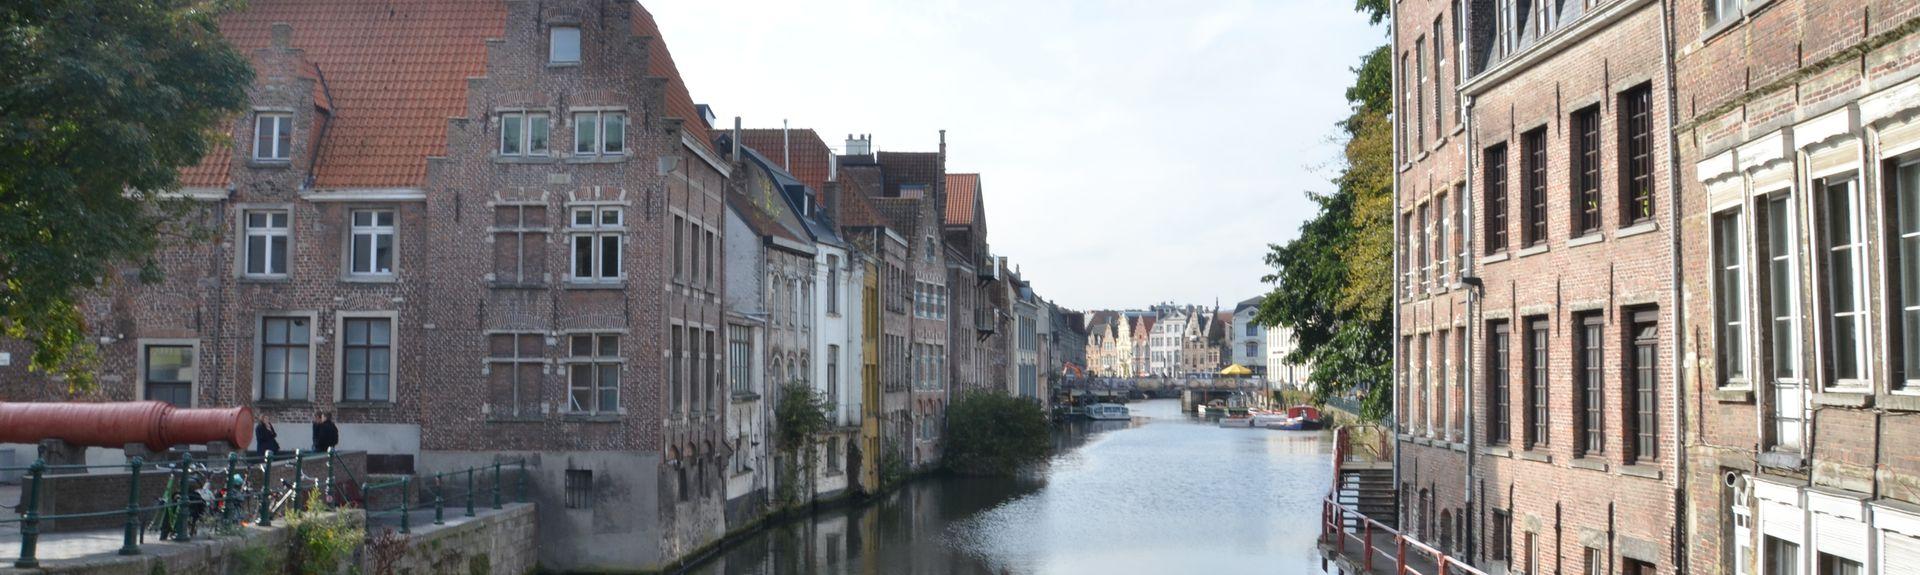 Gavere, Den Flamske Region, belgien